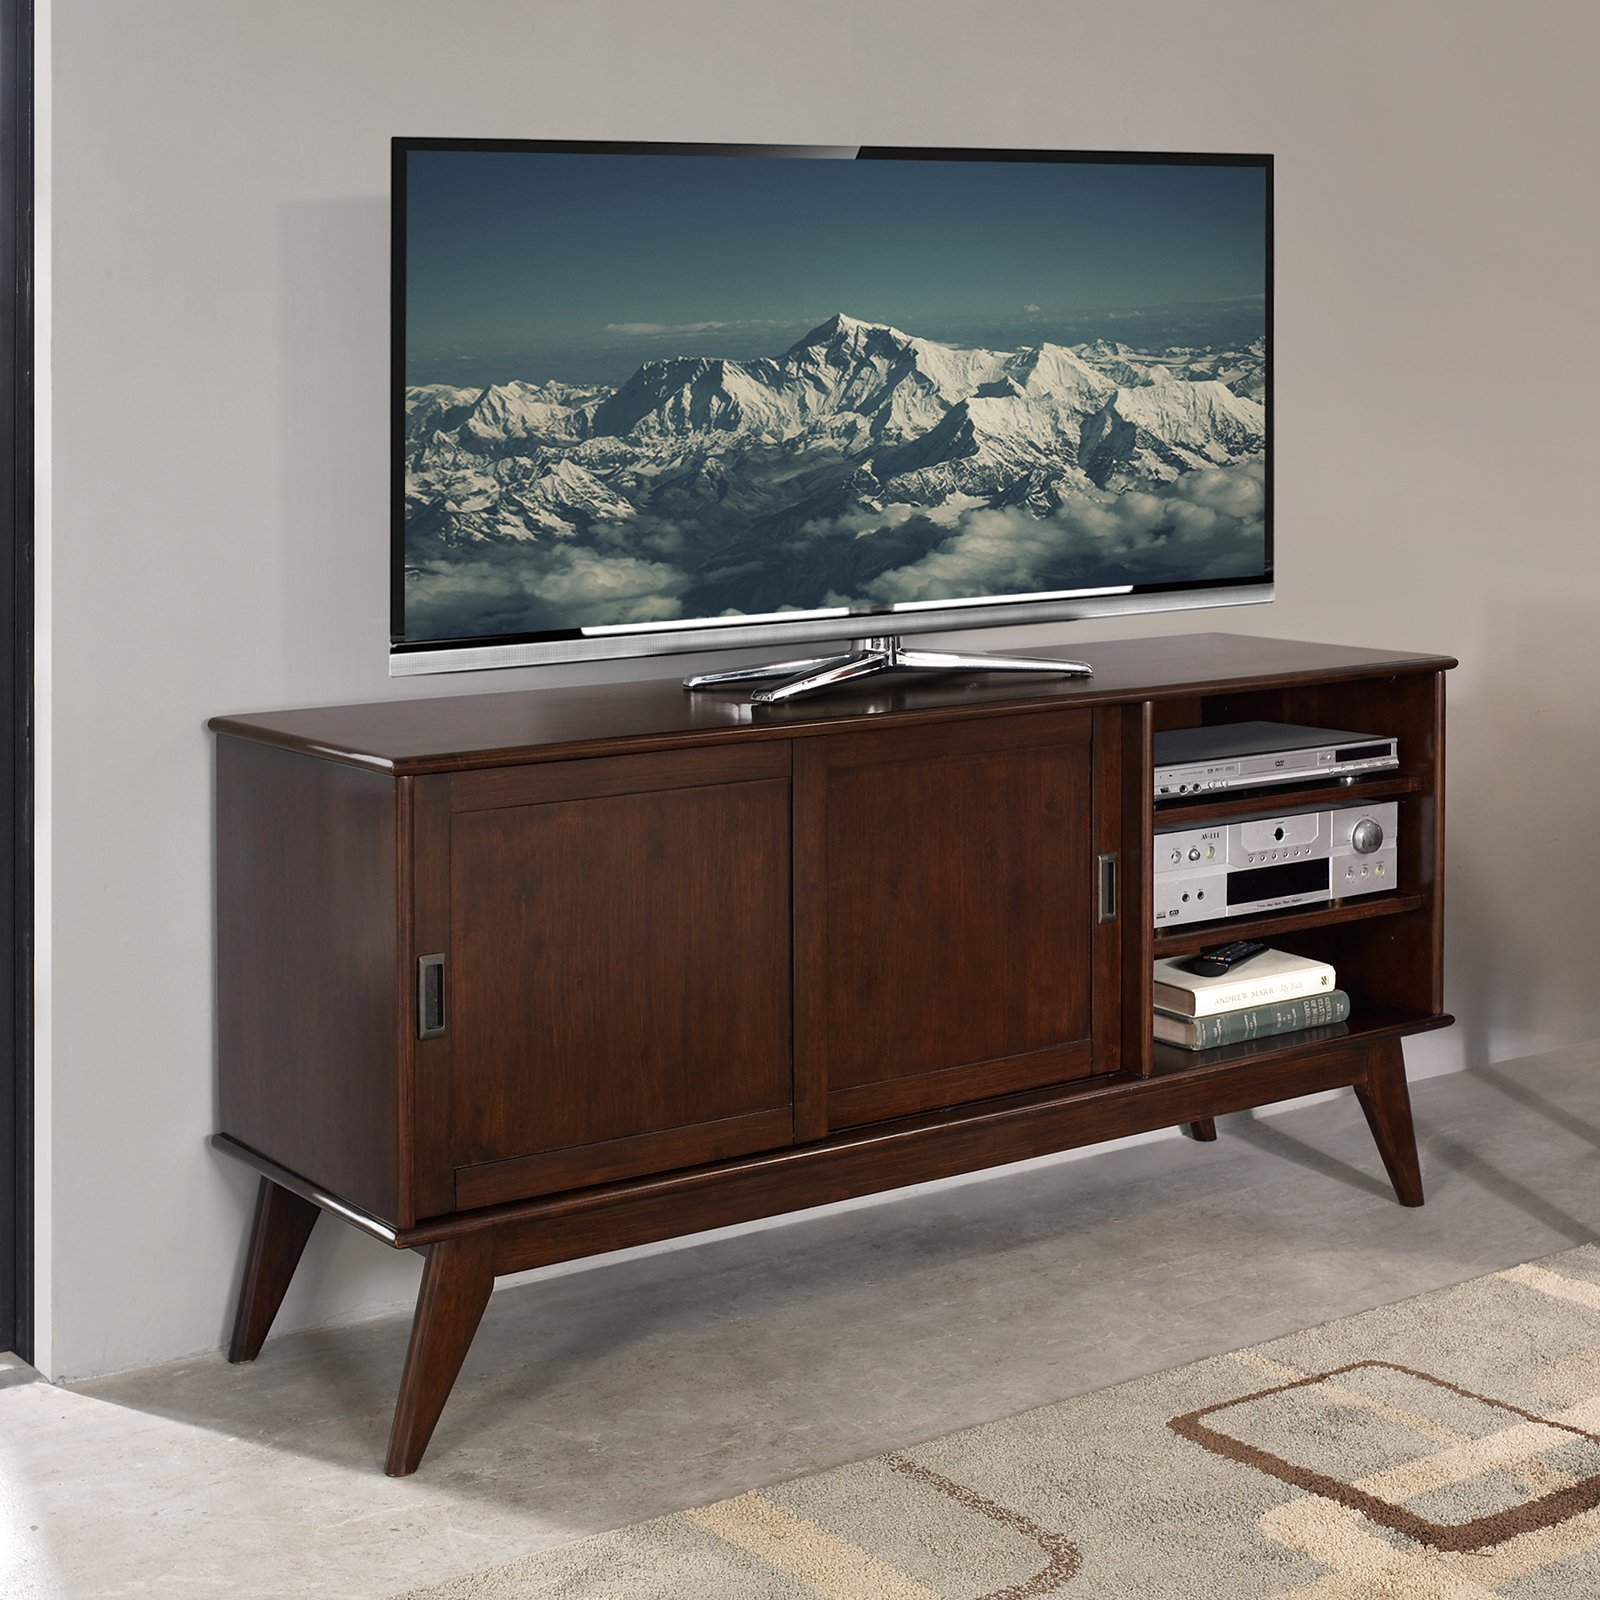 style century modern cabinet mid ideas stand tv